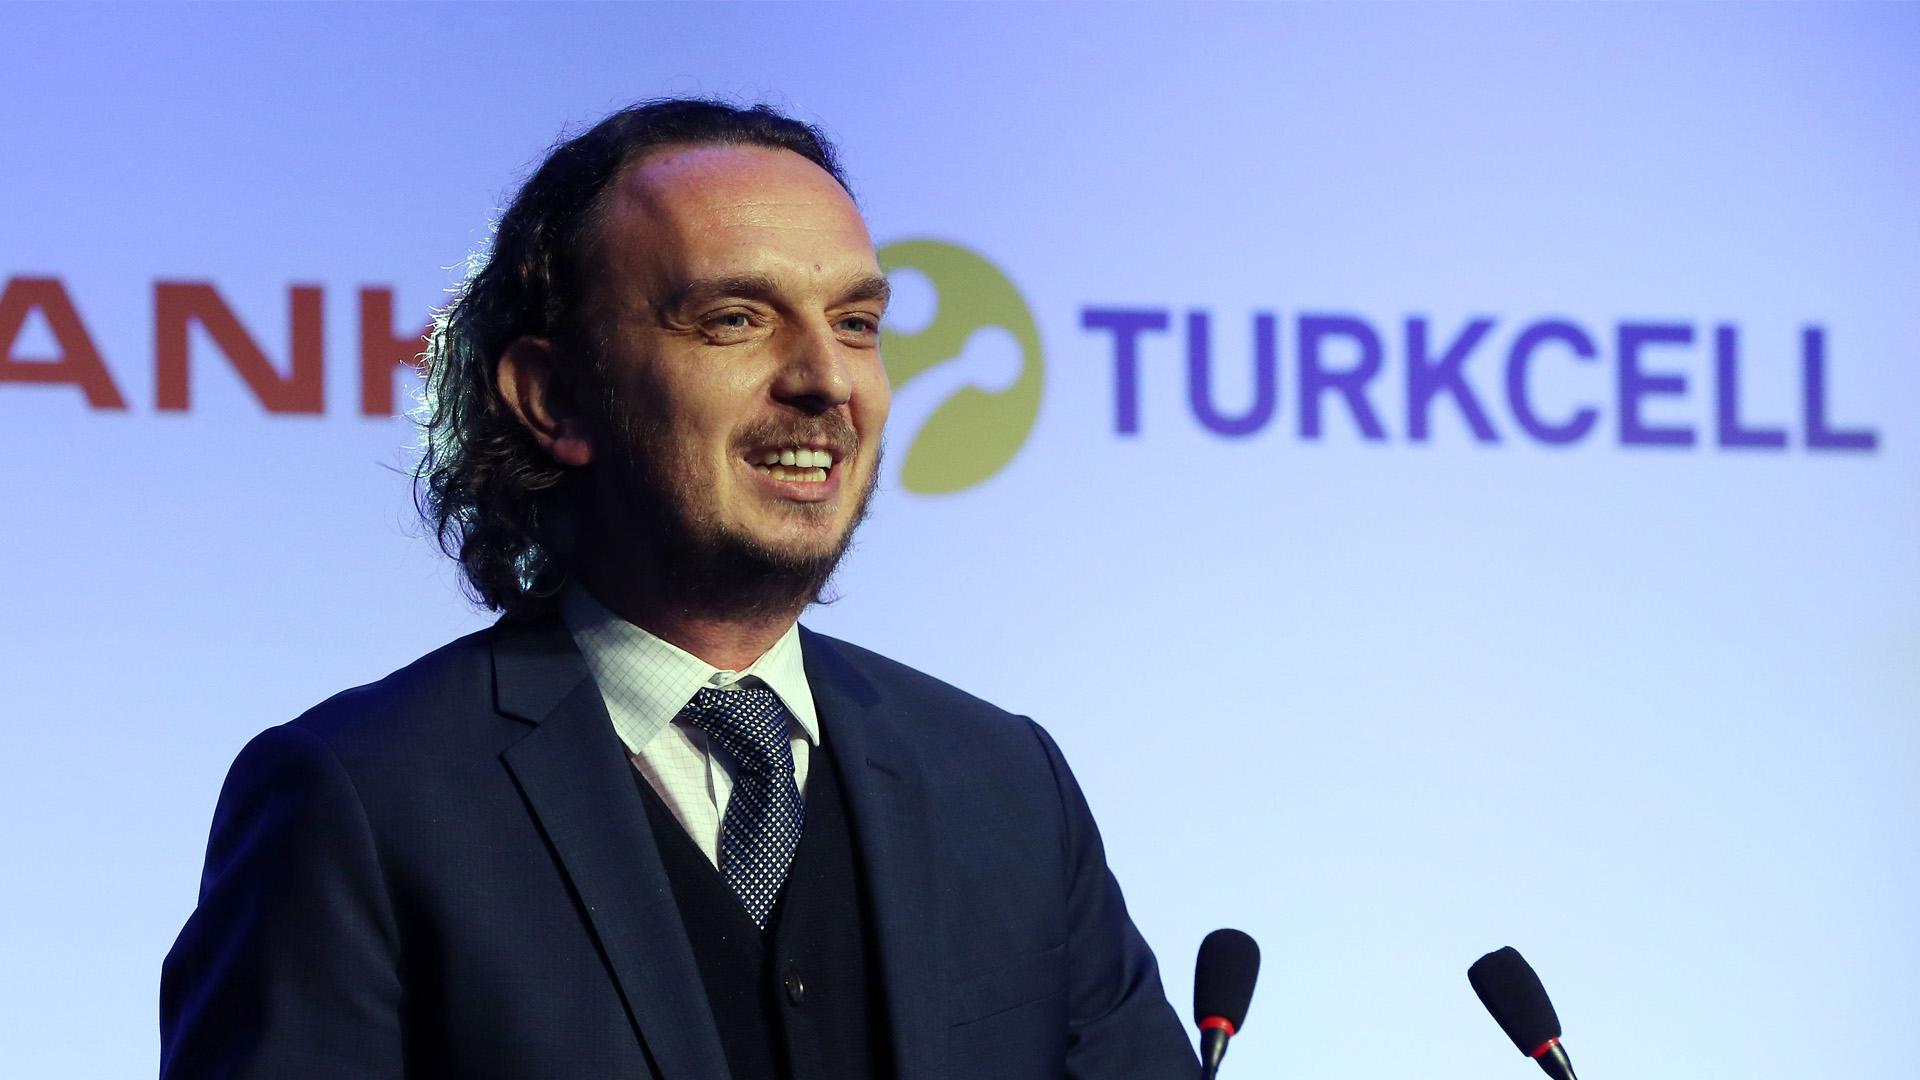 Turkcell CMO'su Ömer Barbaros Yiş Görevinden Ayrıldı